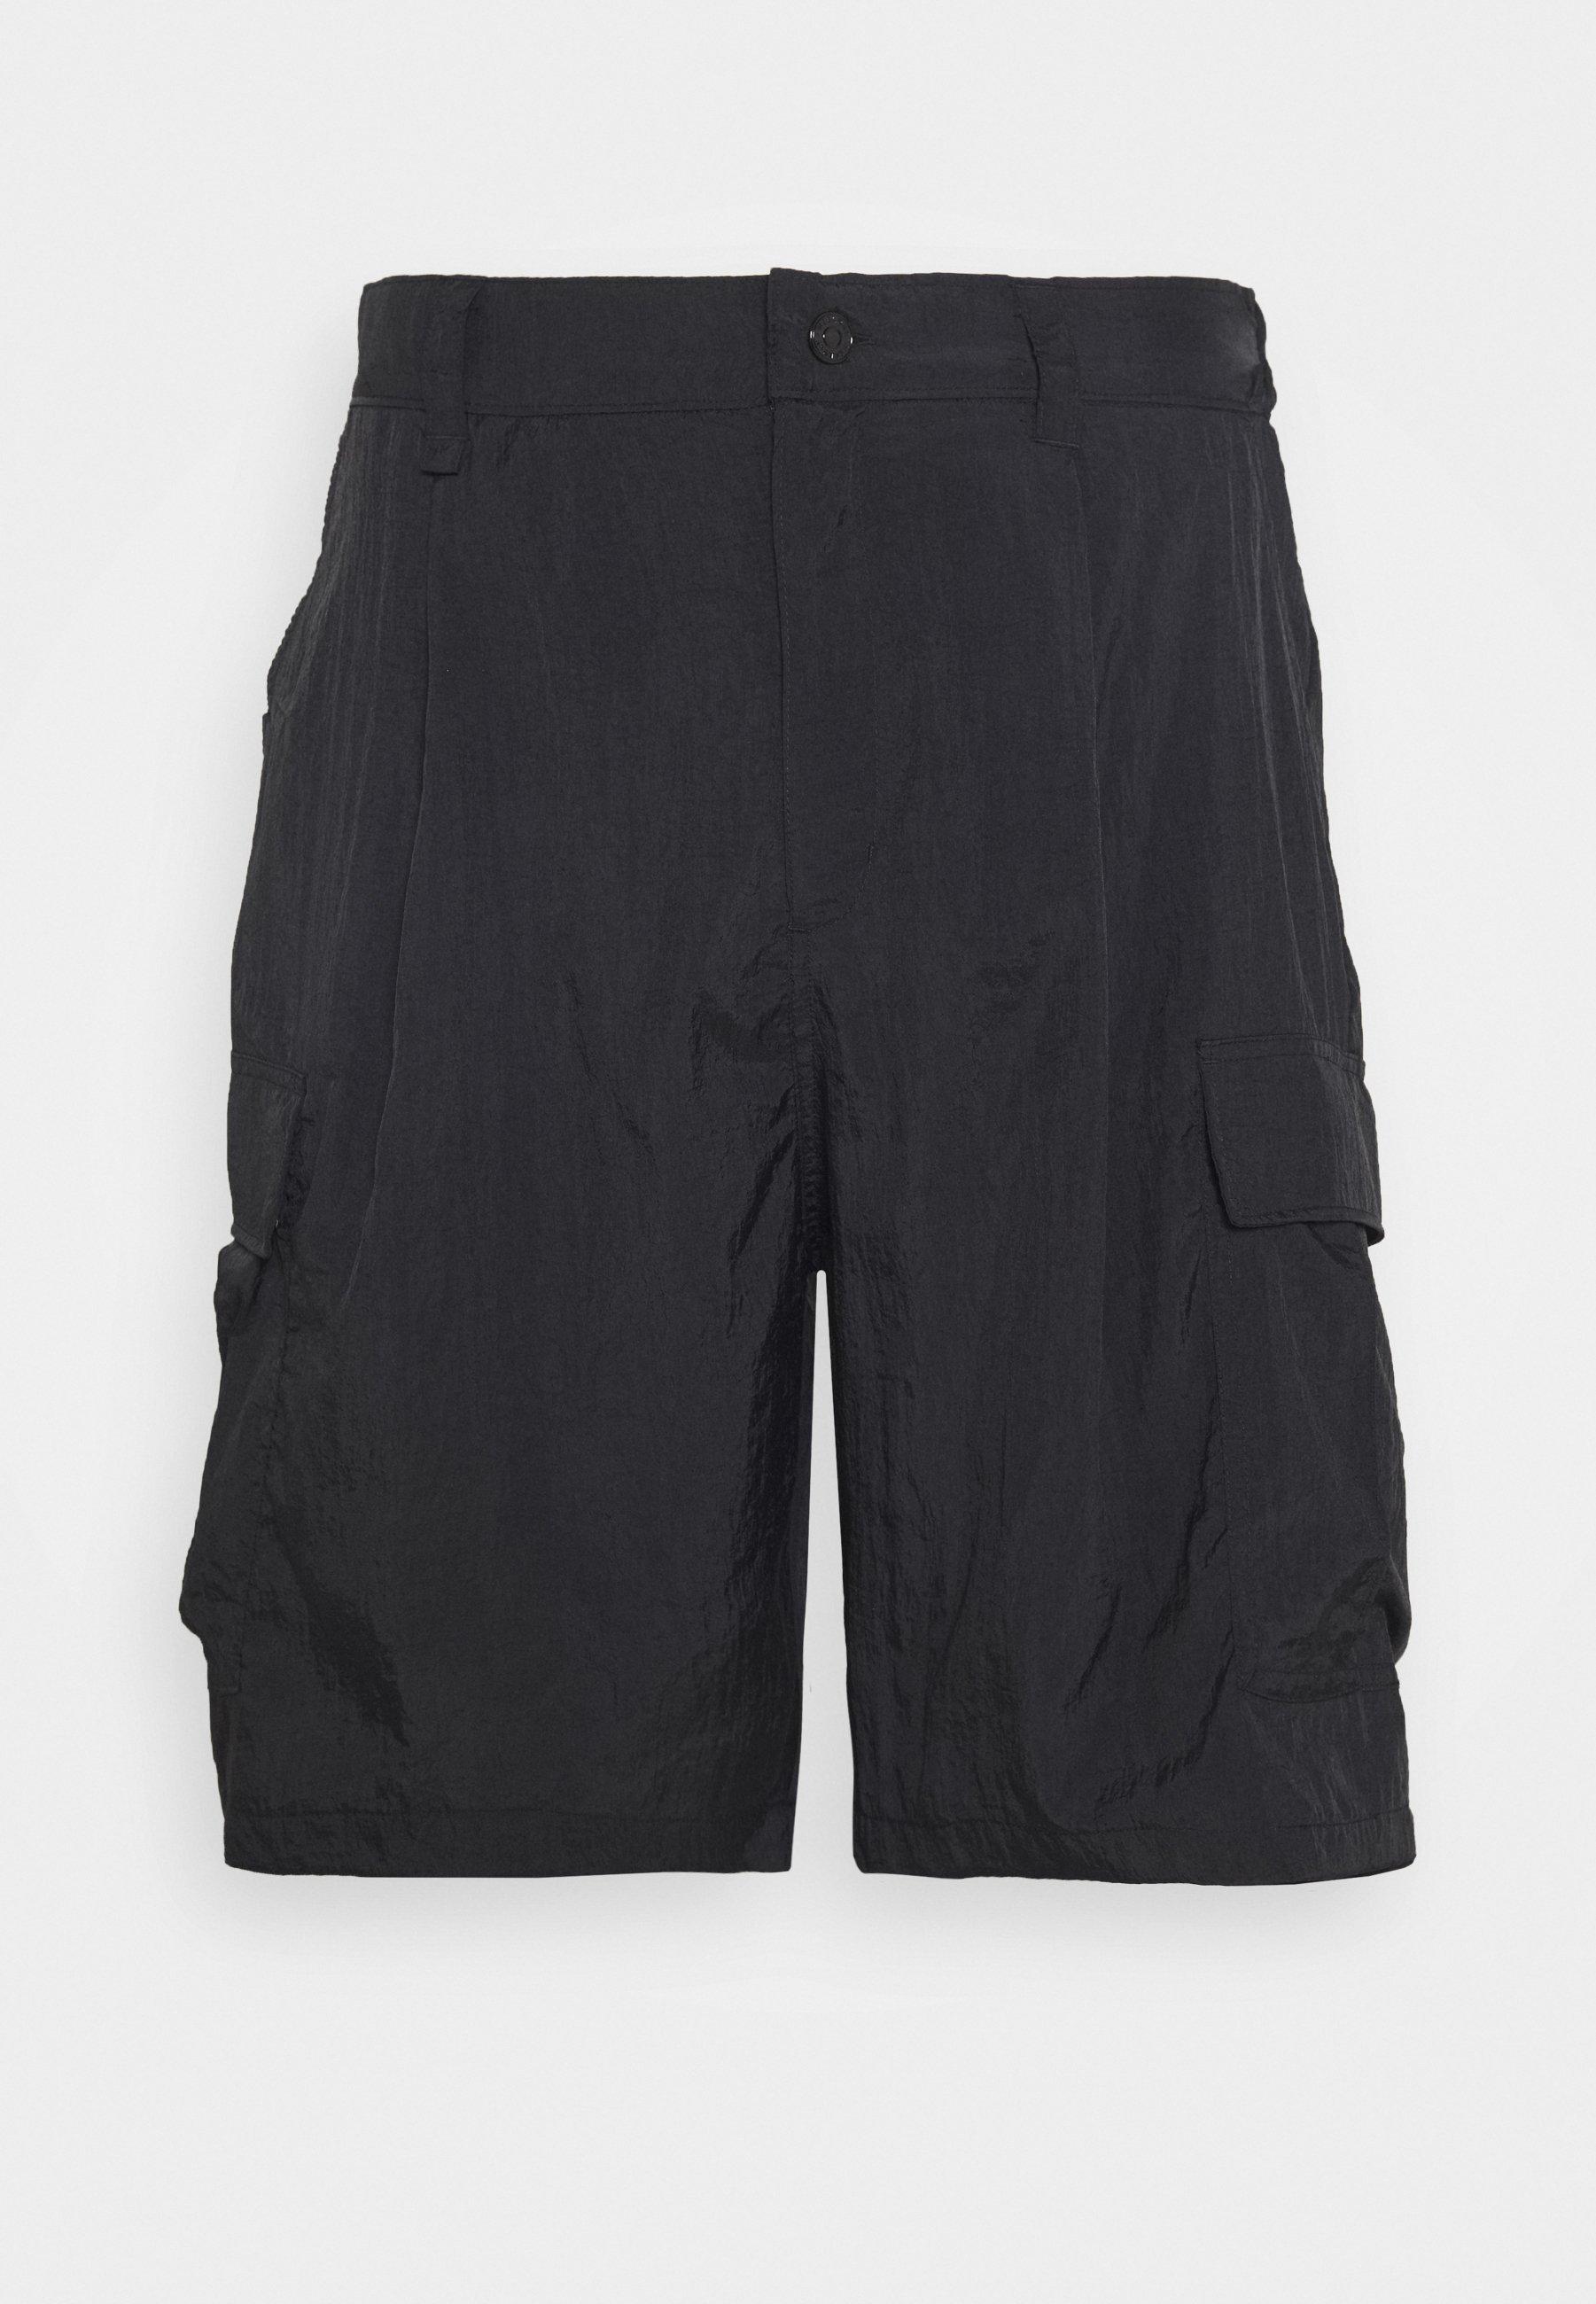 Weekday Linton Cargo - Shorts Black/svart